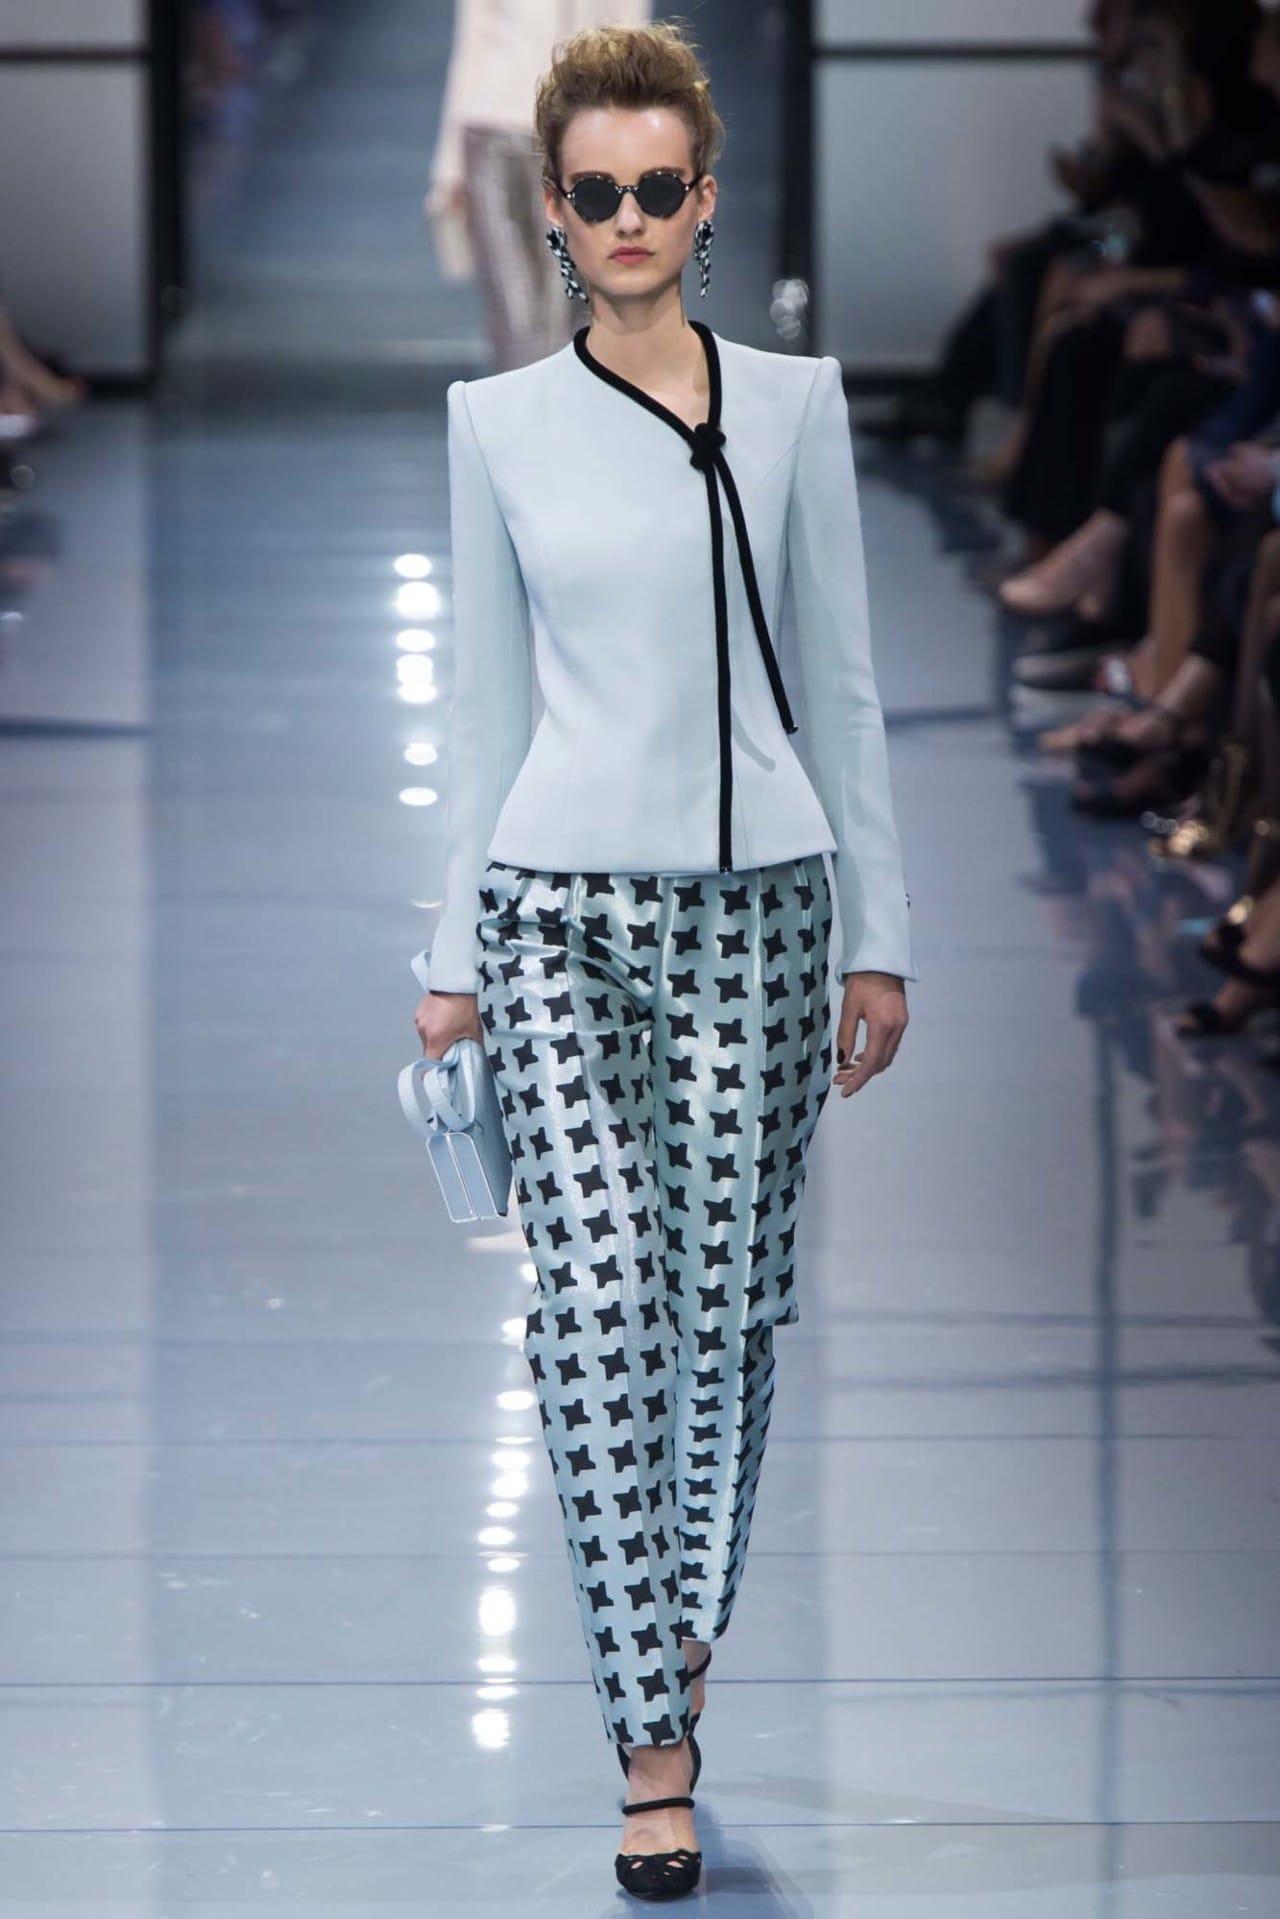 Armani Privé haute couture autumn/winter '16/'17